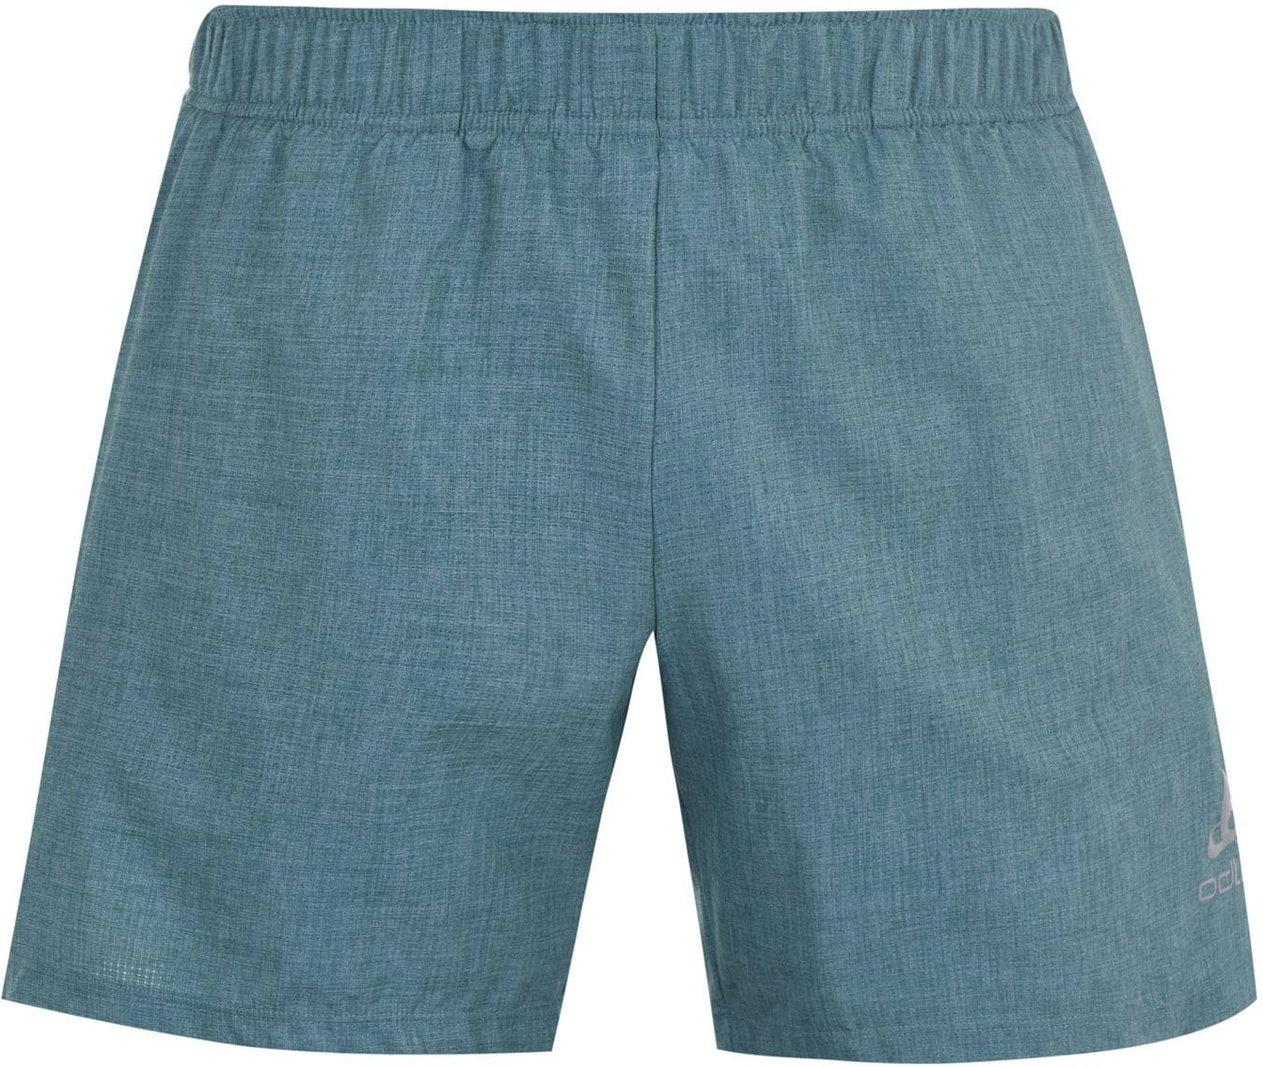 Ceramicoo Shorts Mens